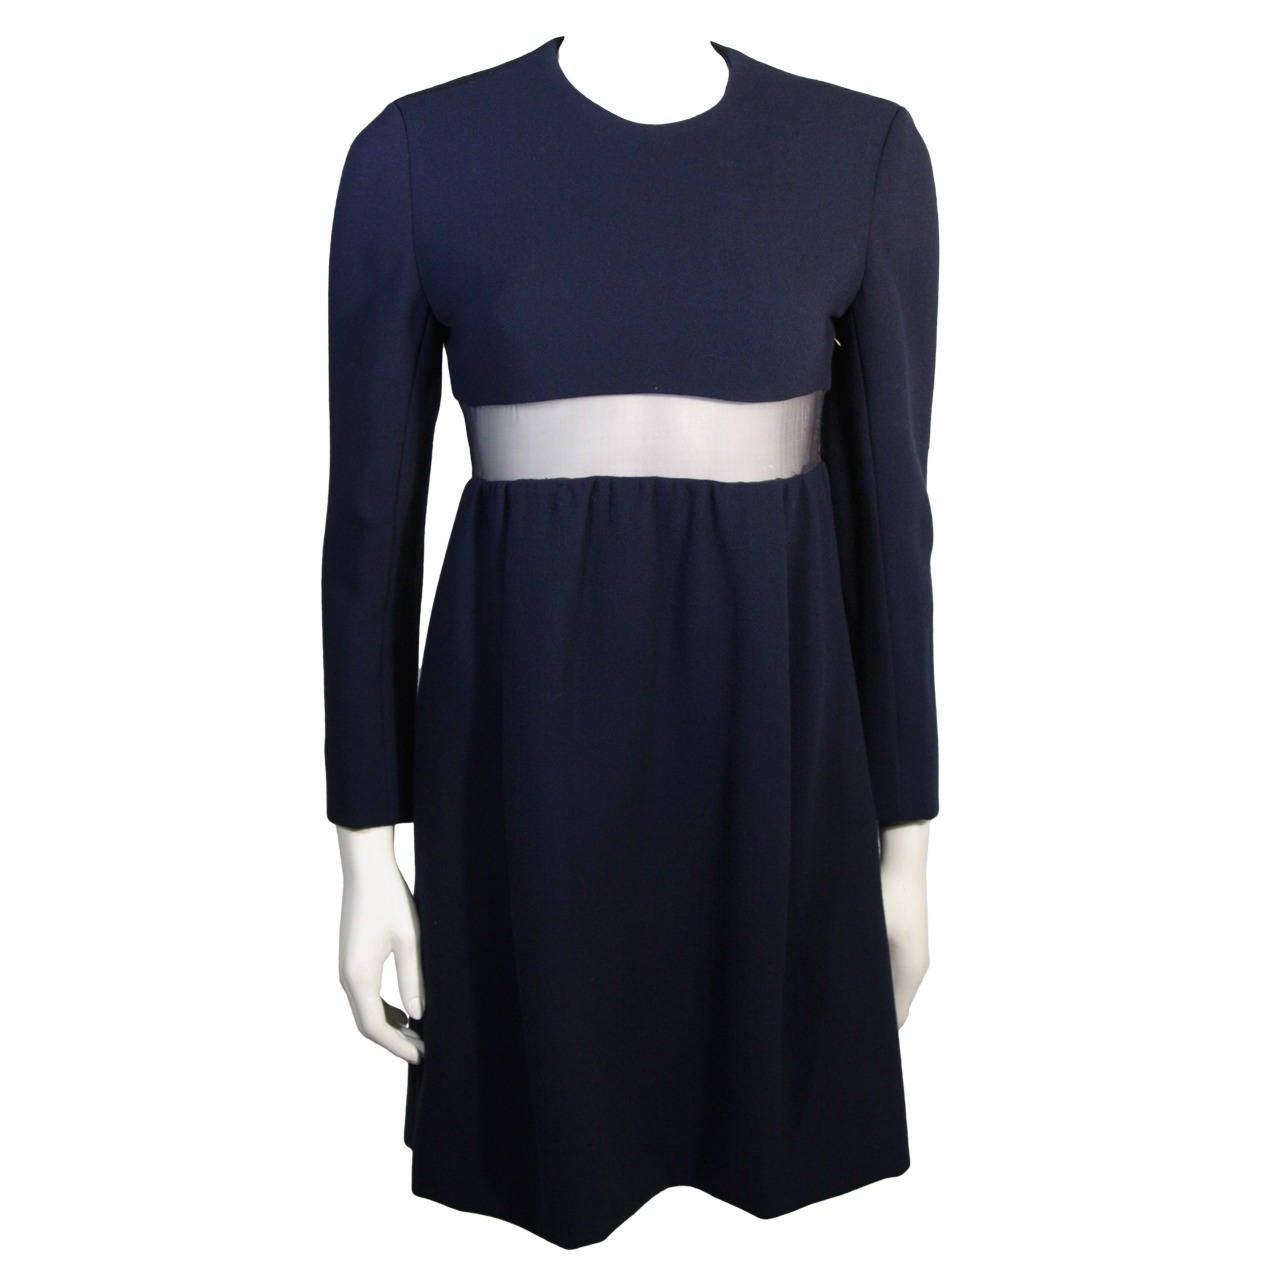 Galanos Navy Wool Mini Dress with Peek-a-boo Mesh Panel size 4